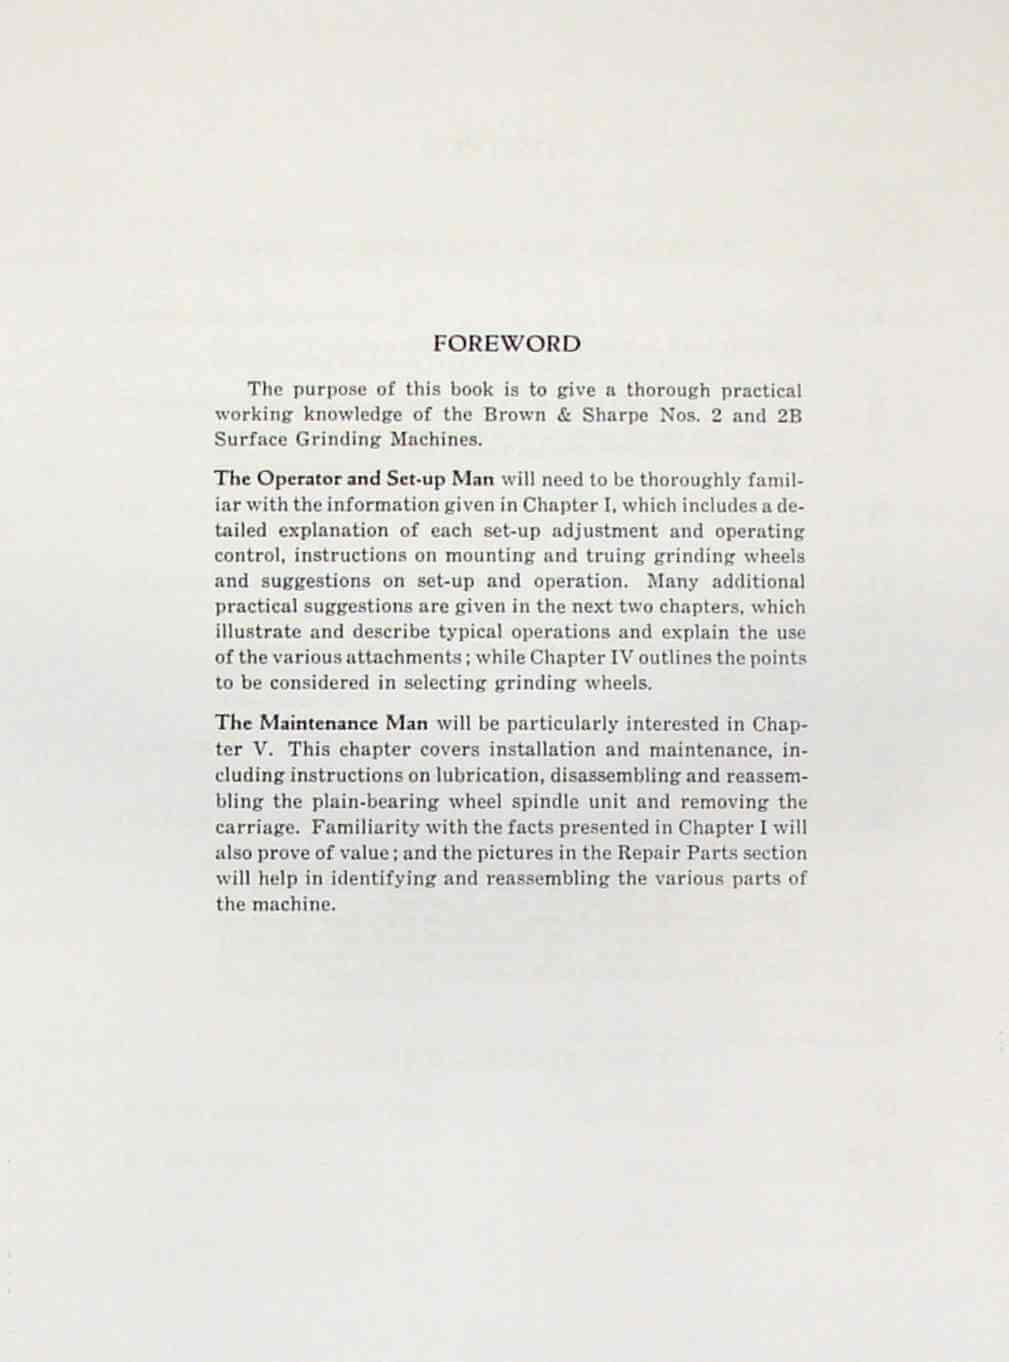 brown and sharpe cmm manual pdf